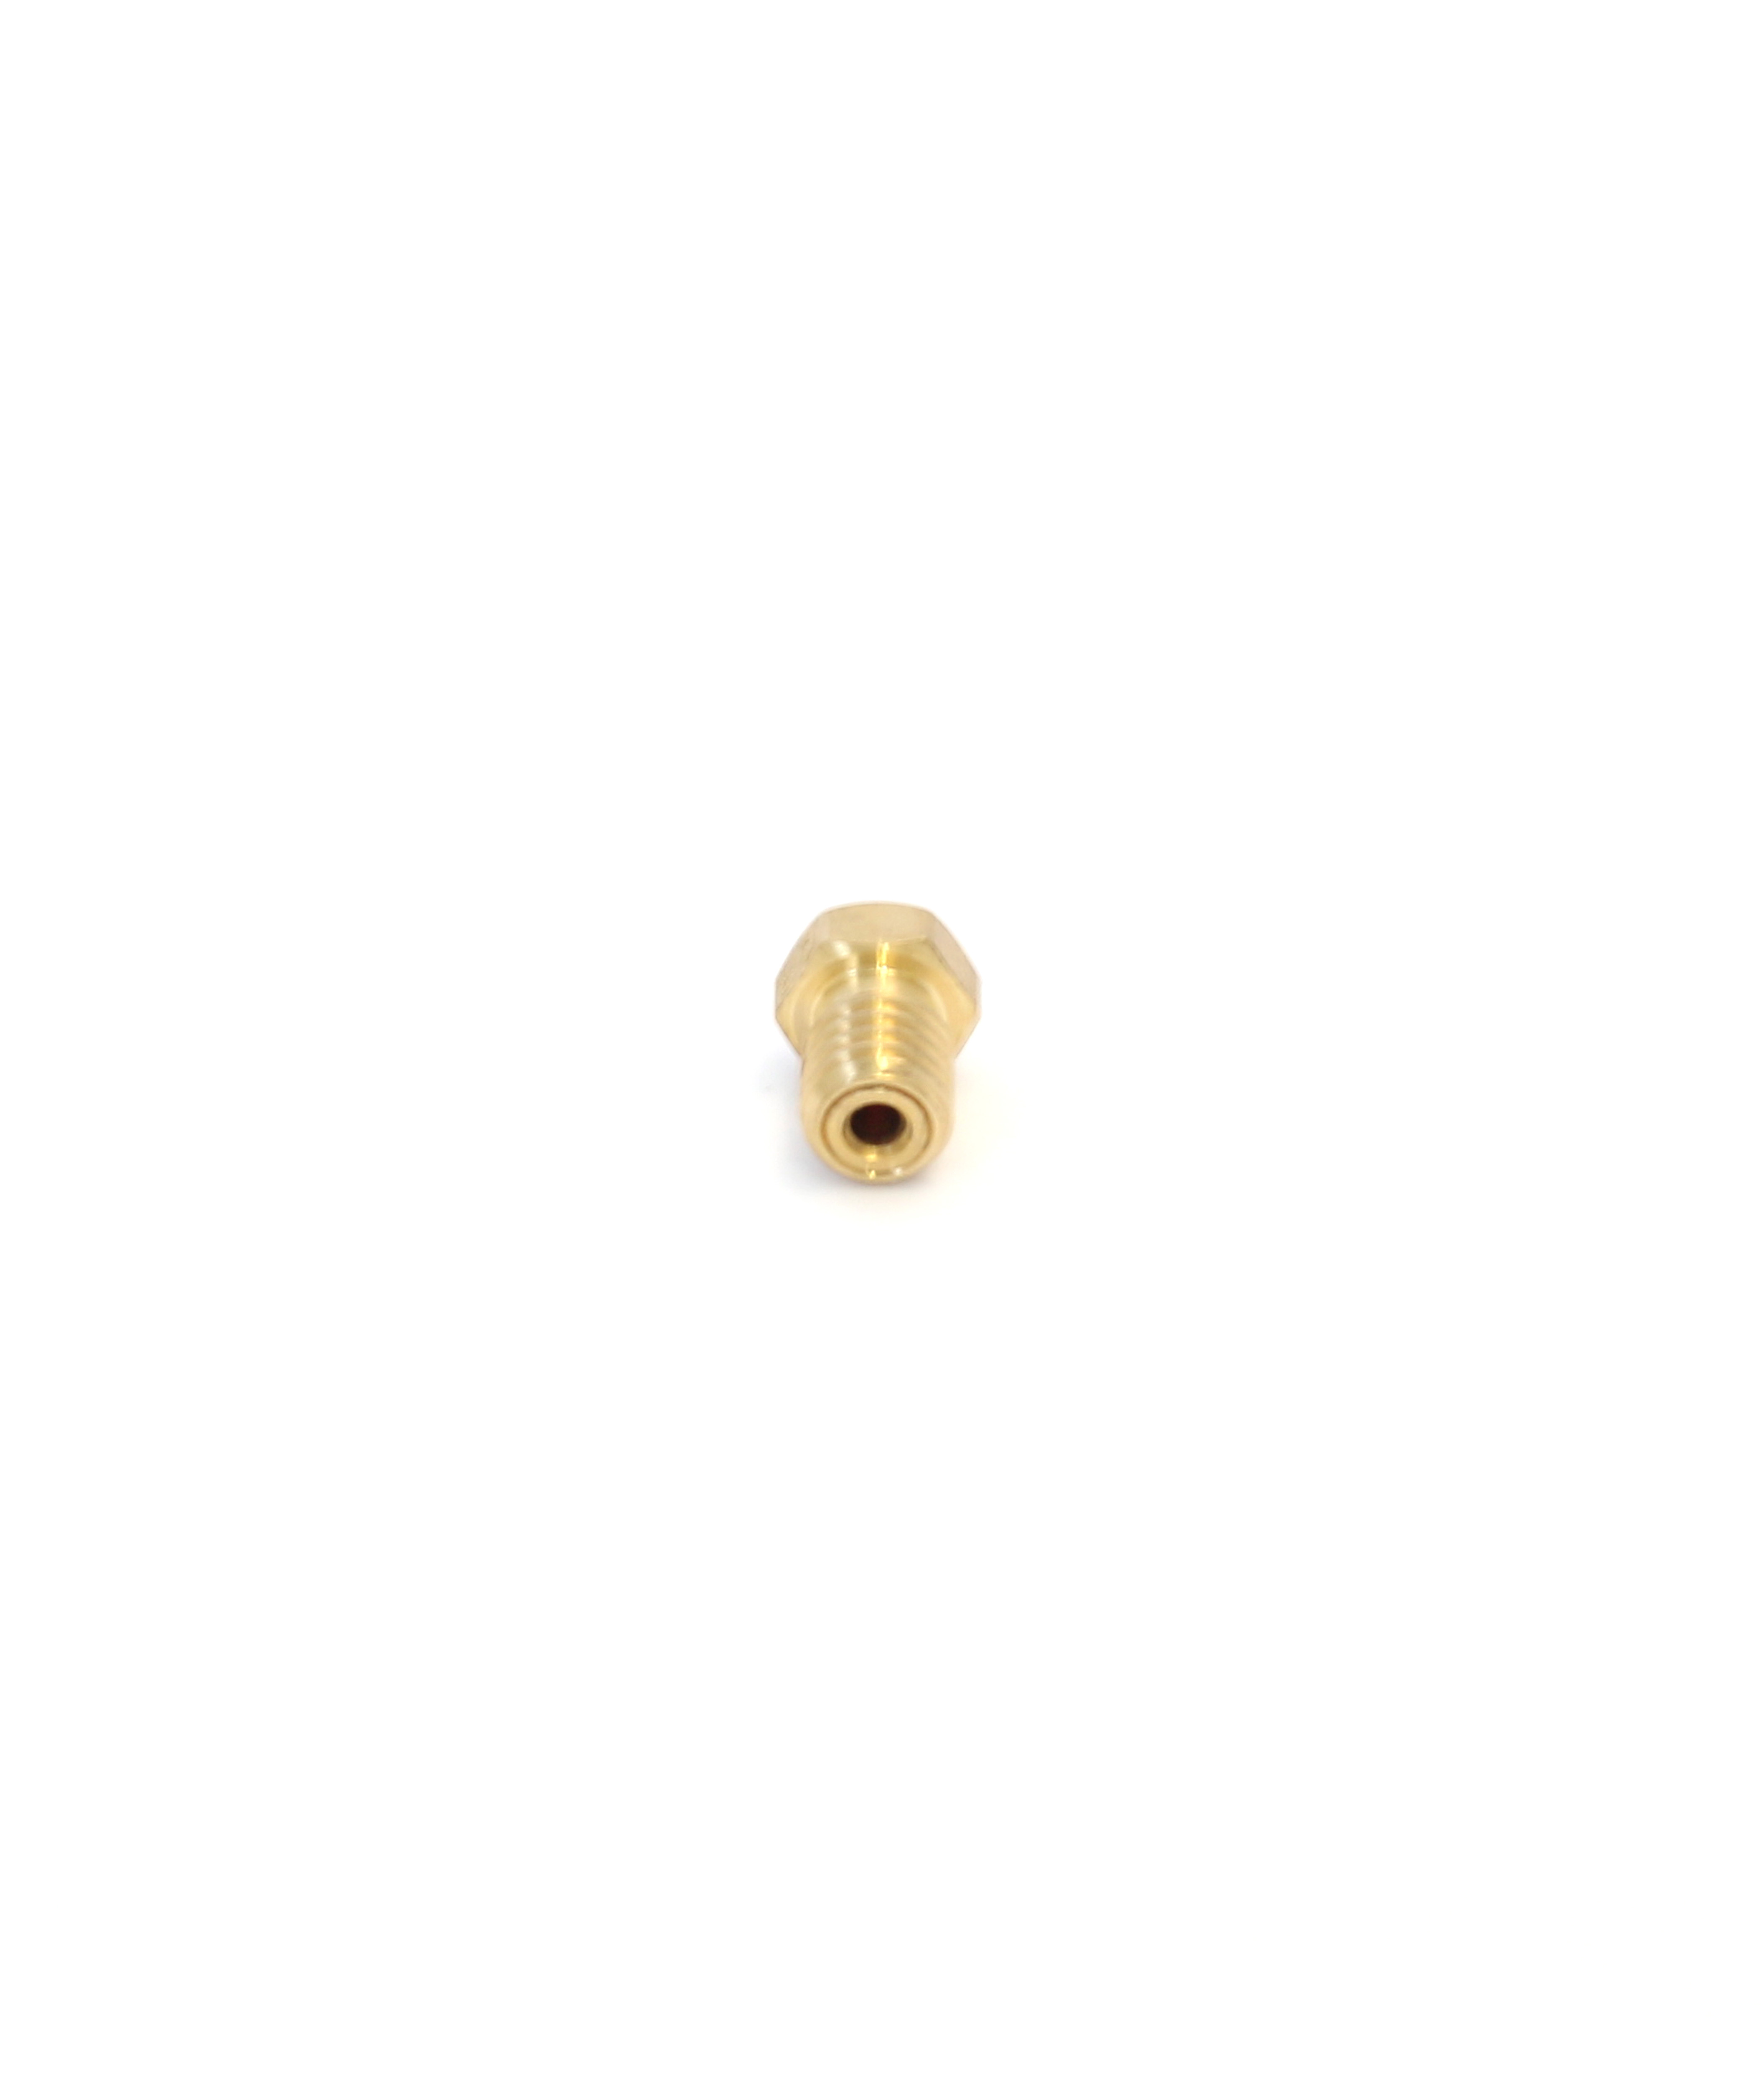 Olsson Ruby Nozzle Wear Resistant Genuine Uk Supplier